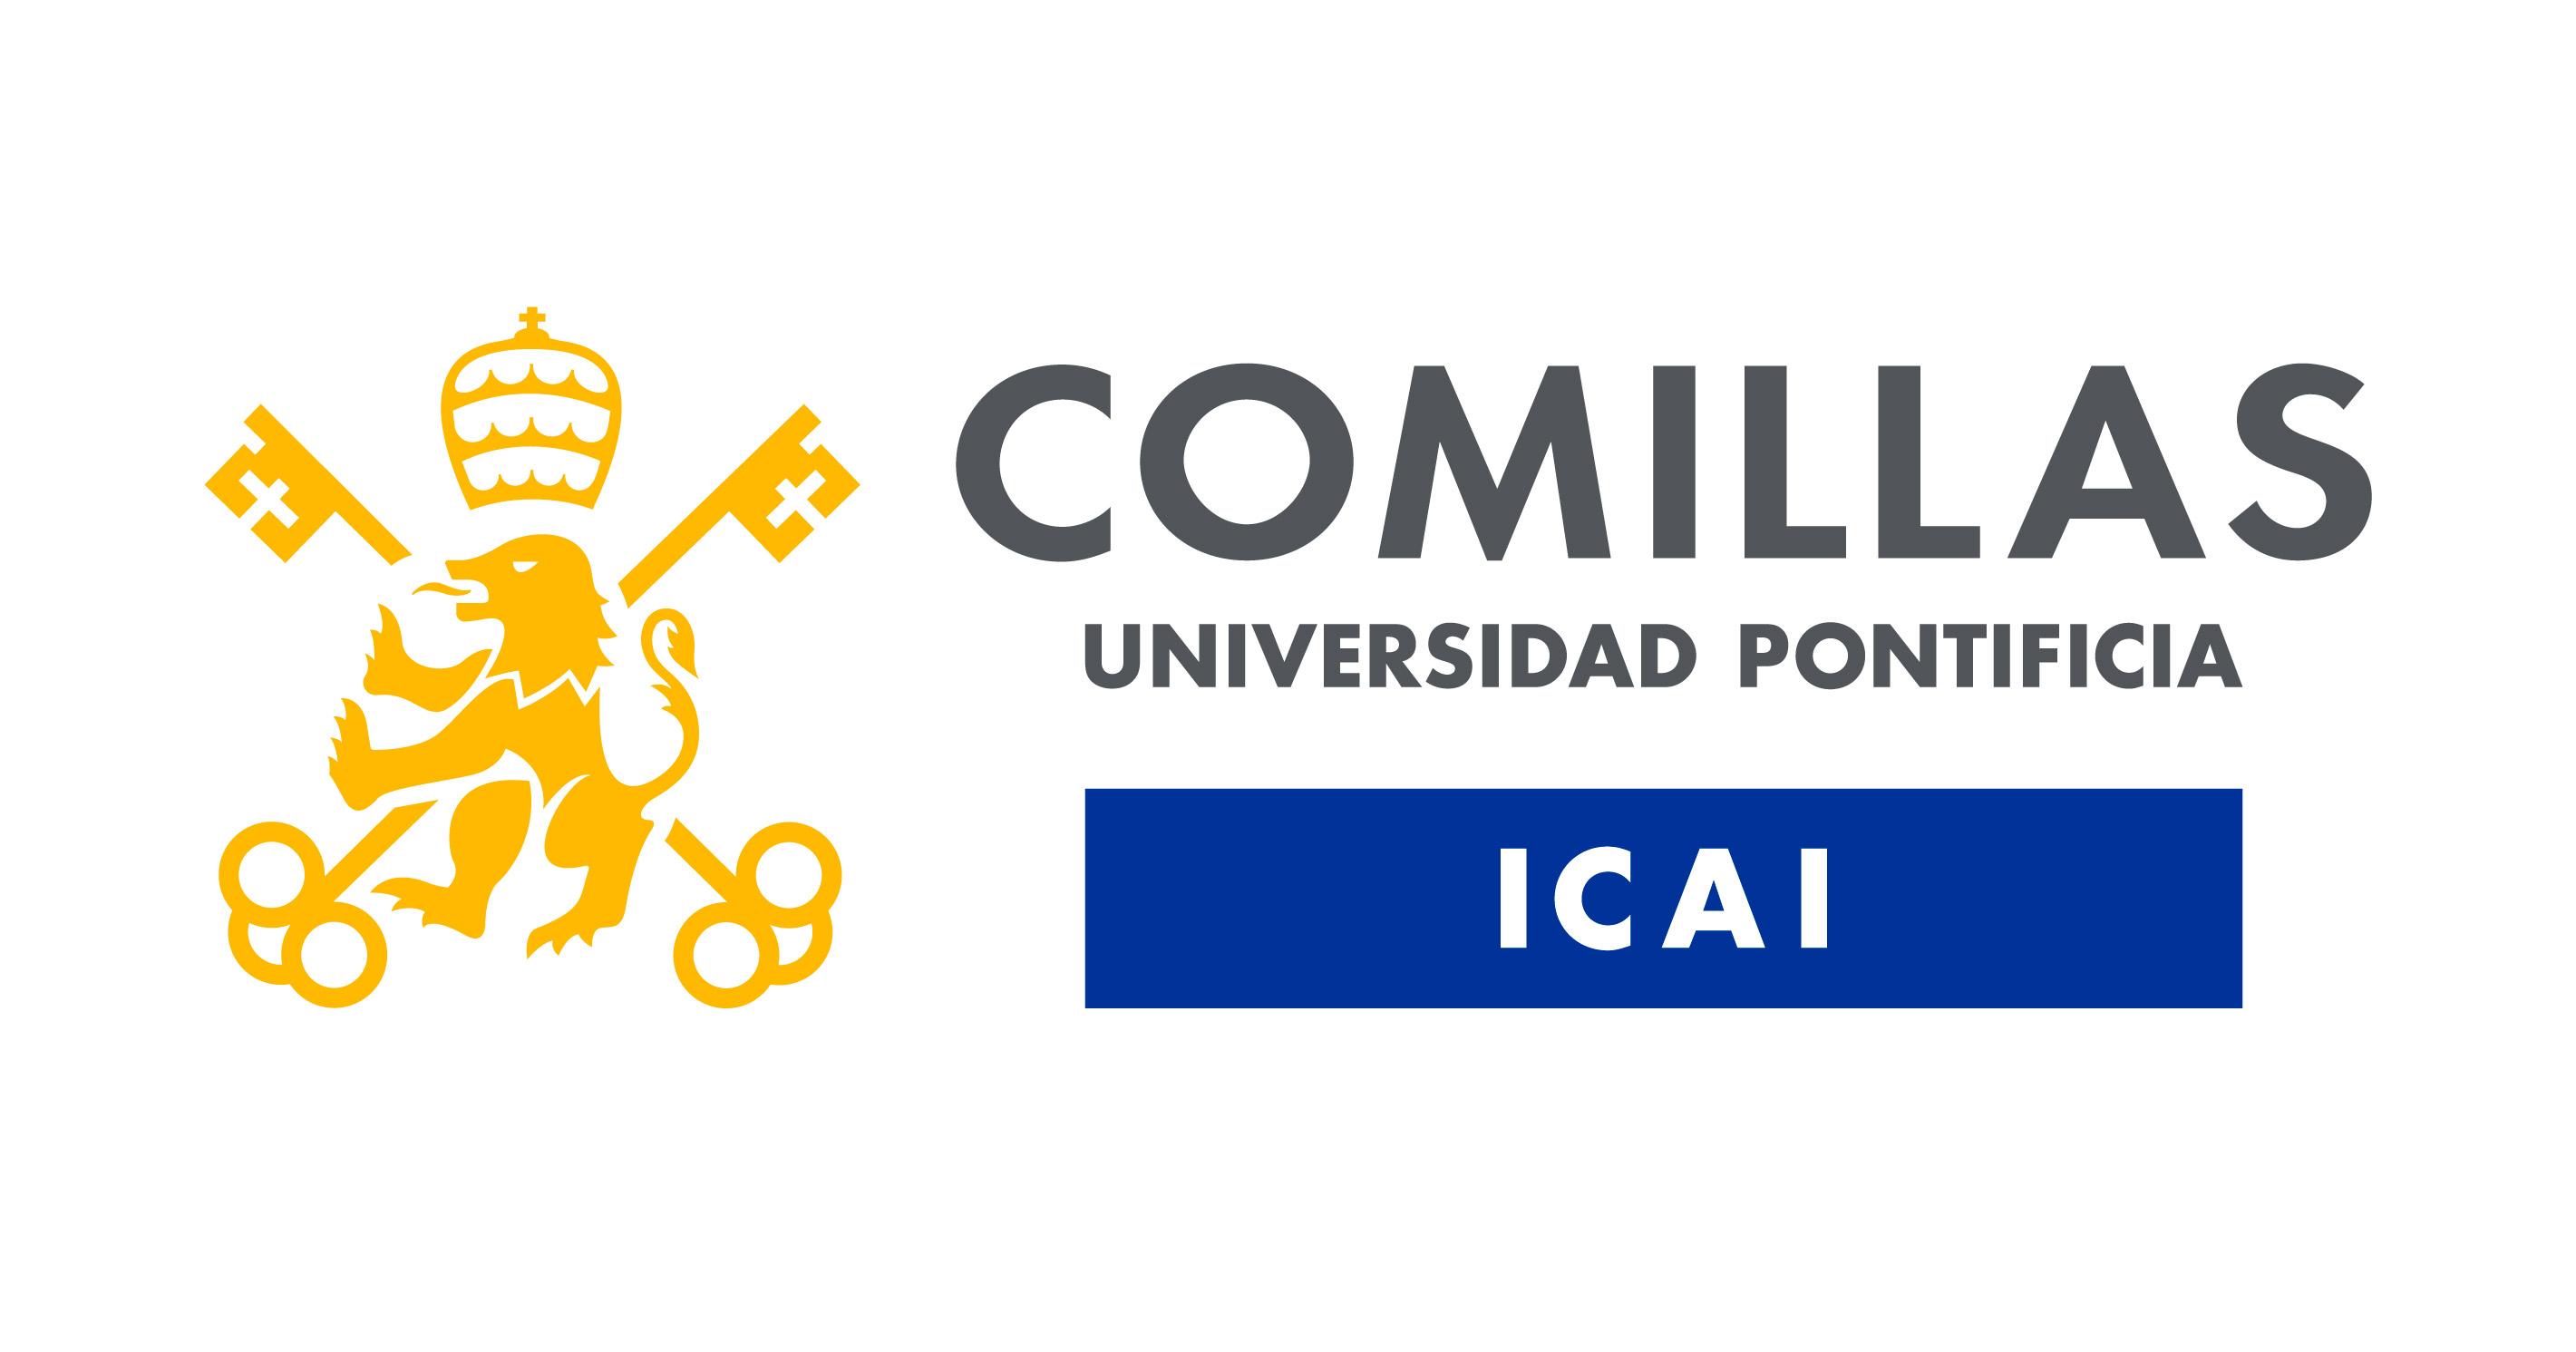 Comillas ICAI